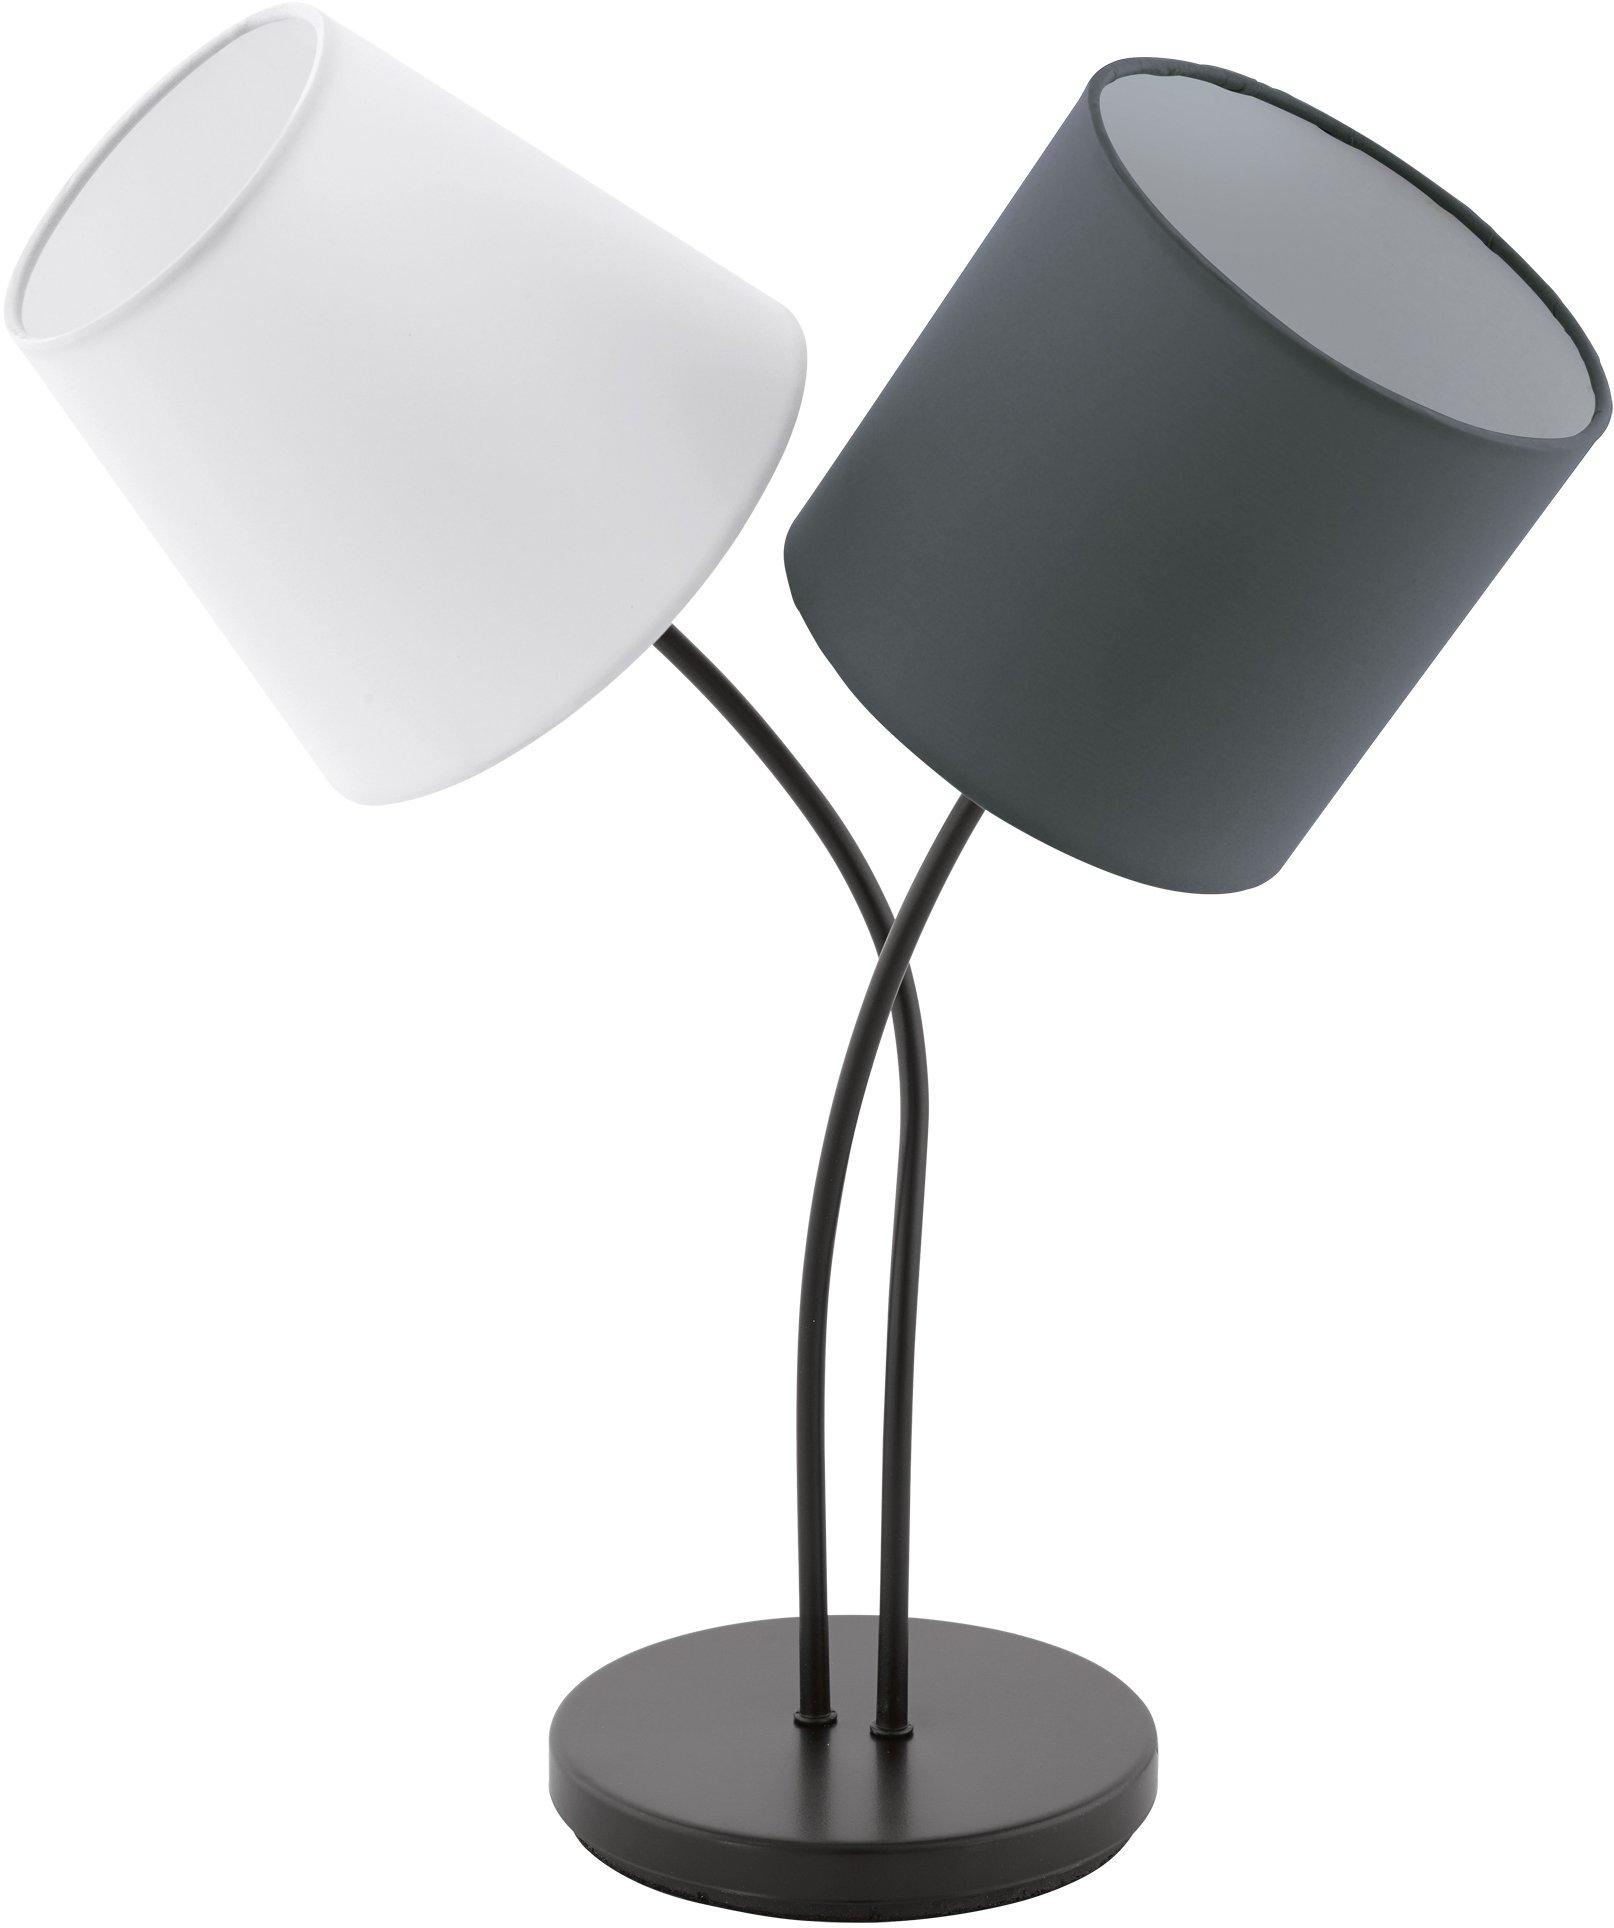 EGLO tafellamp ALMEIDA online kopen op otto.nl